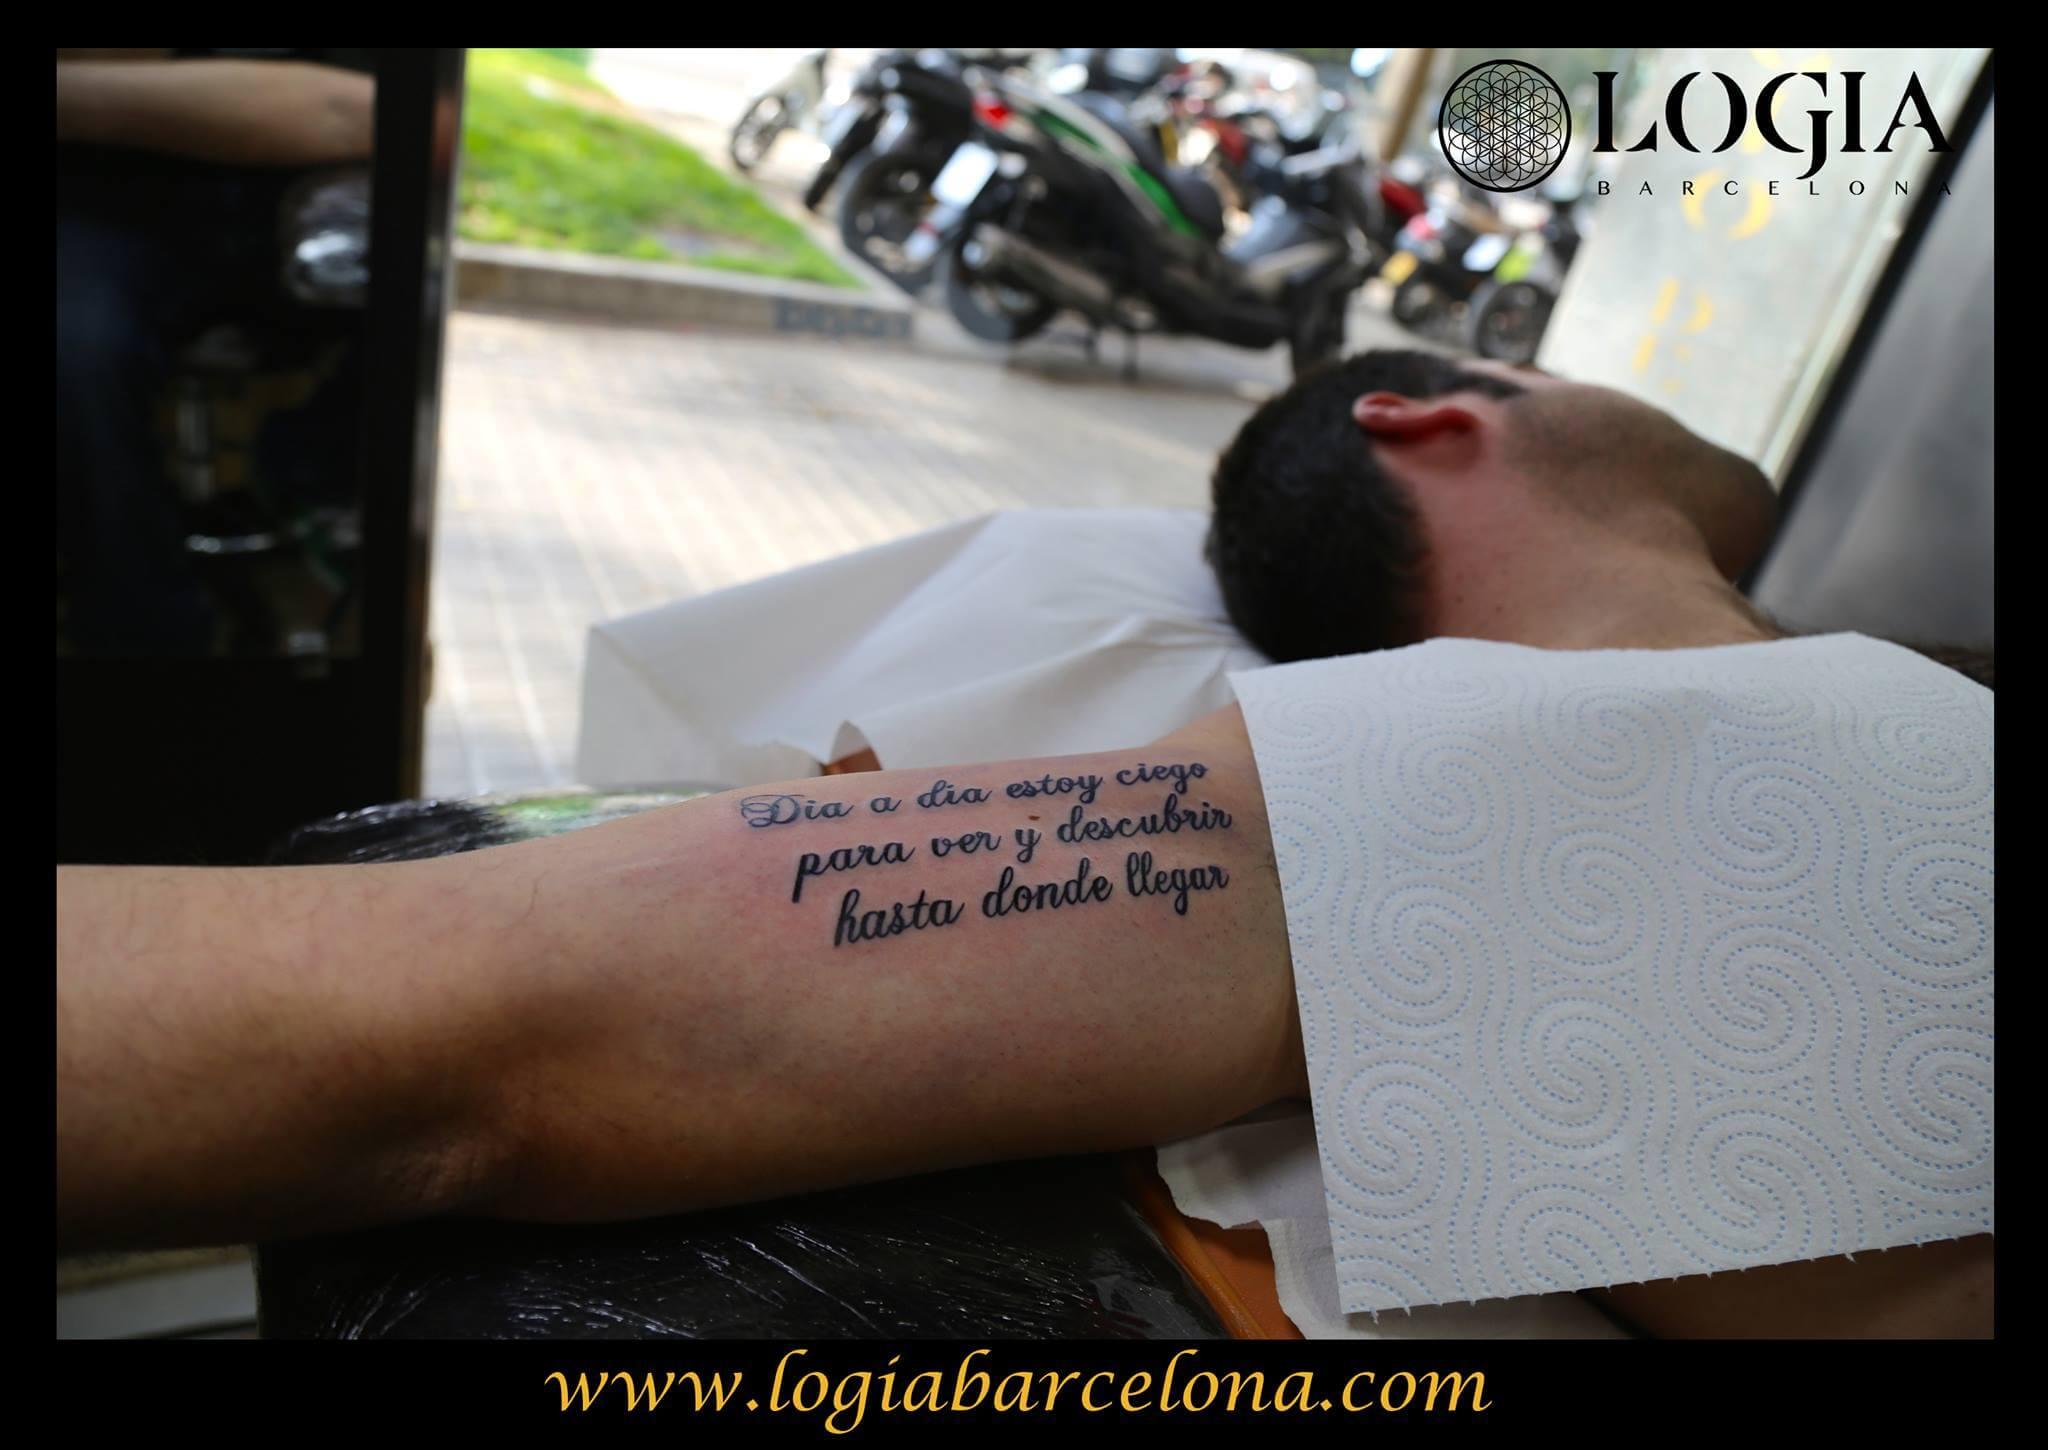 Letras Para Tatuarse Tatuajes Logia Barcelona